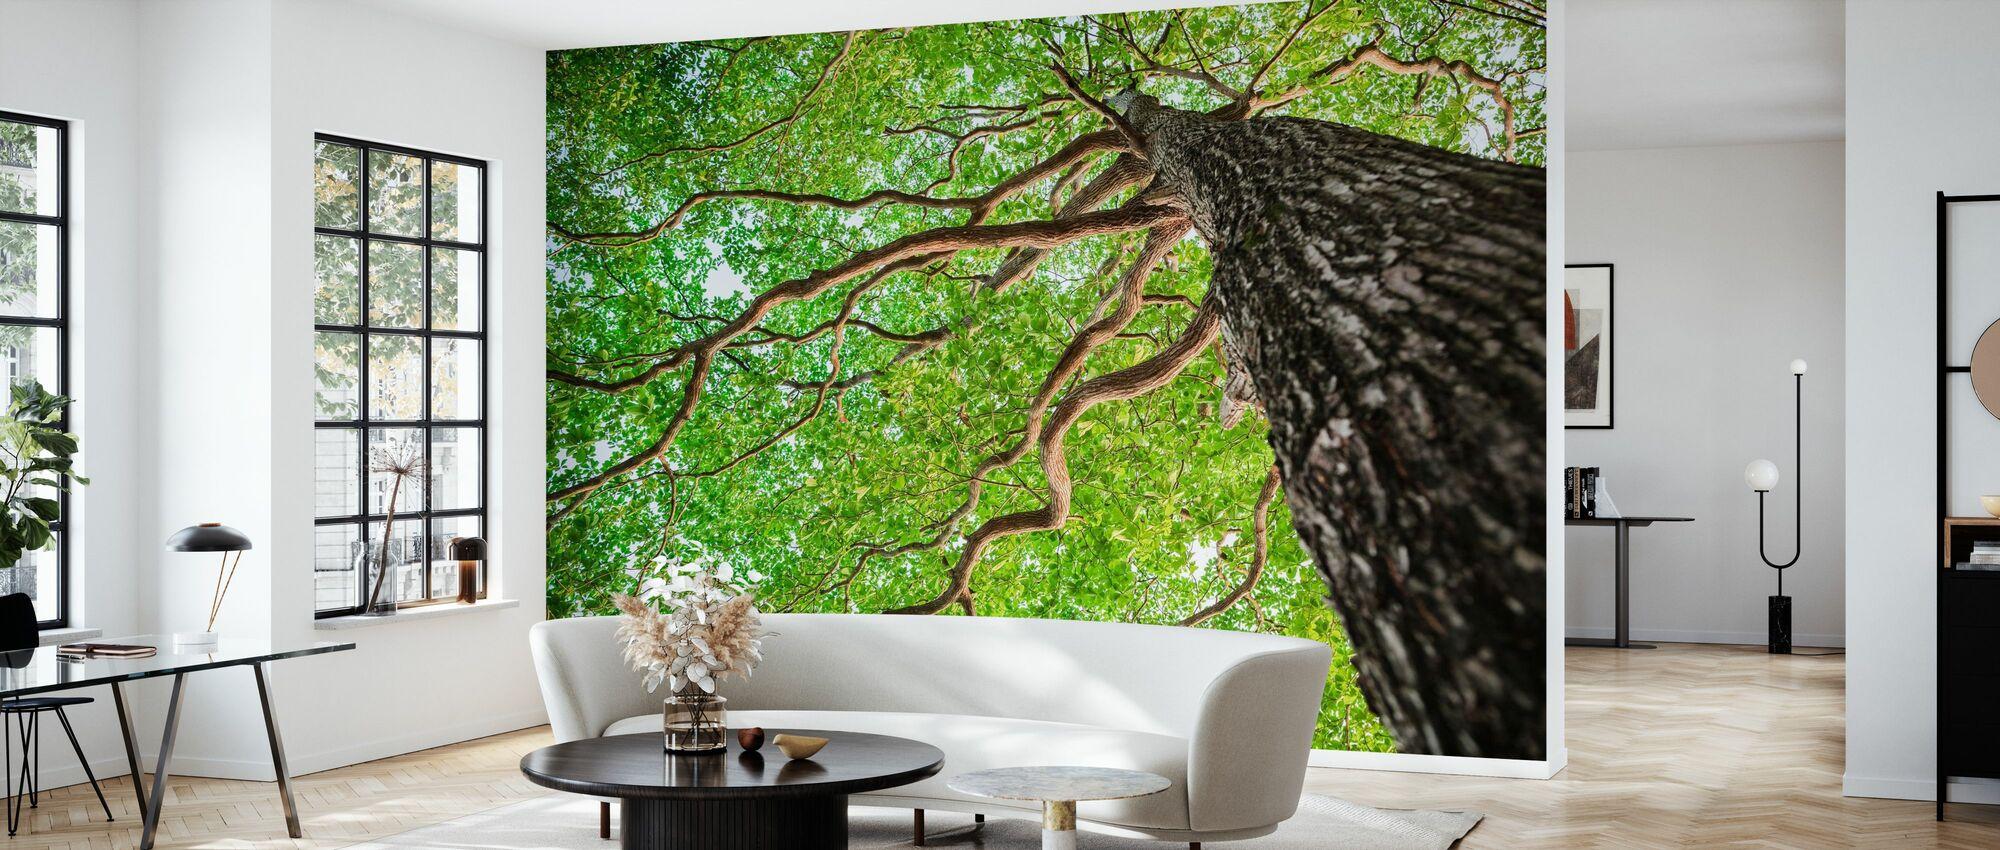 Green Leaf Tree - Wallpaper - Living Room